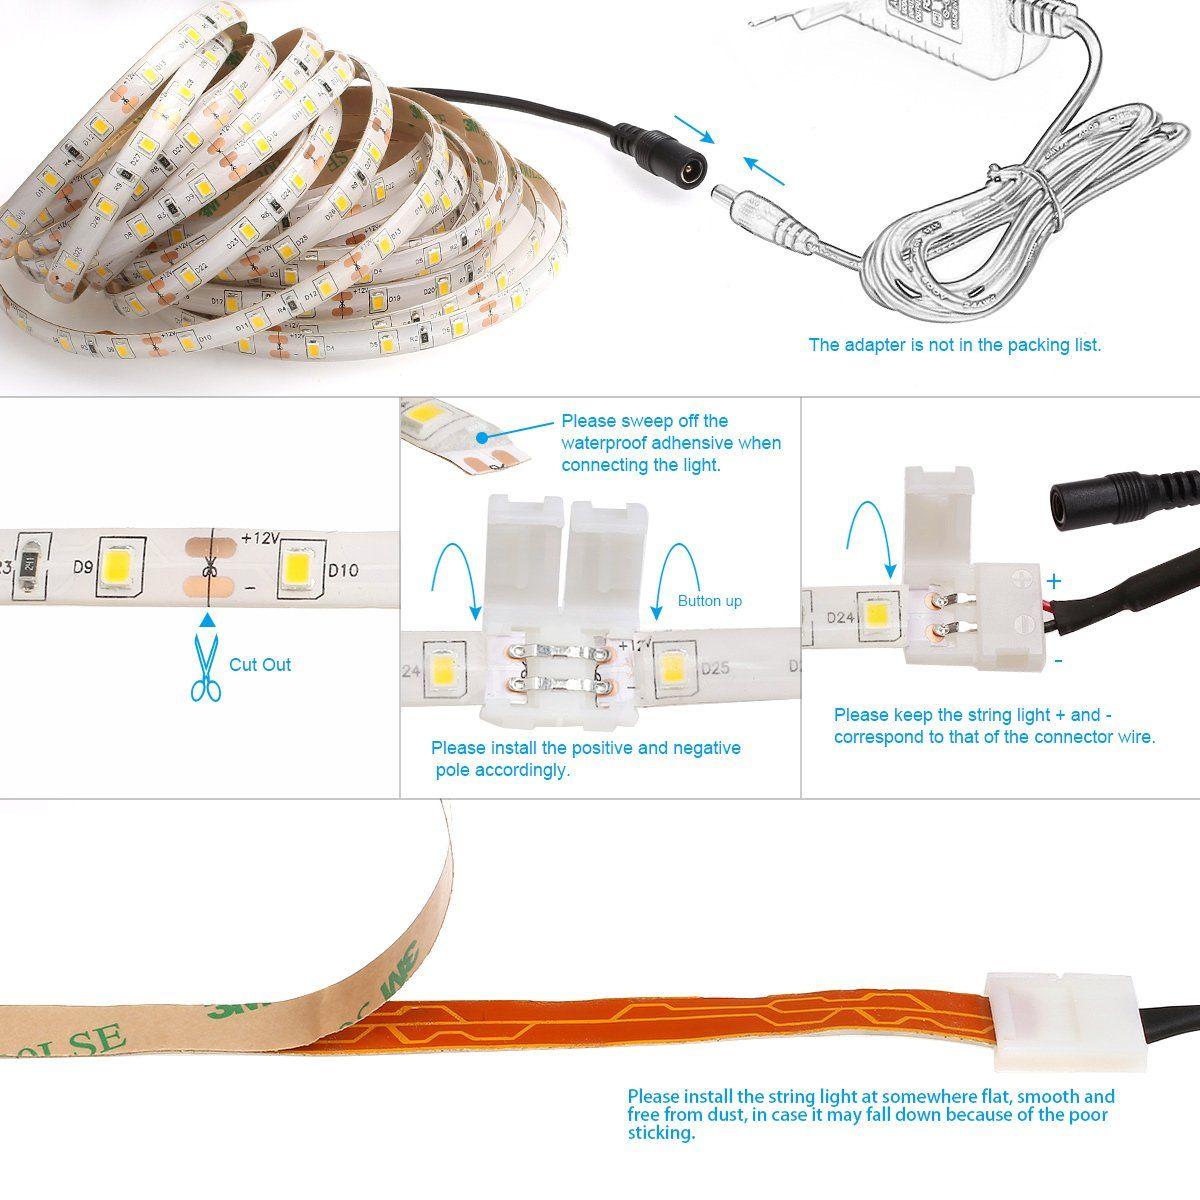 Le 16 4ft Waterproof Flexible Led Light Strip 300 Units Smd 2835 Led 6000k Daylight White Led Tape 12 Led Strip Lighting 12v Led Strip Lights Led Tape Lighting